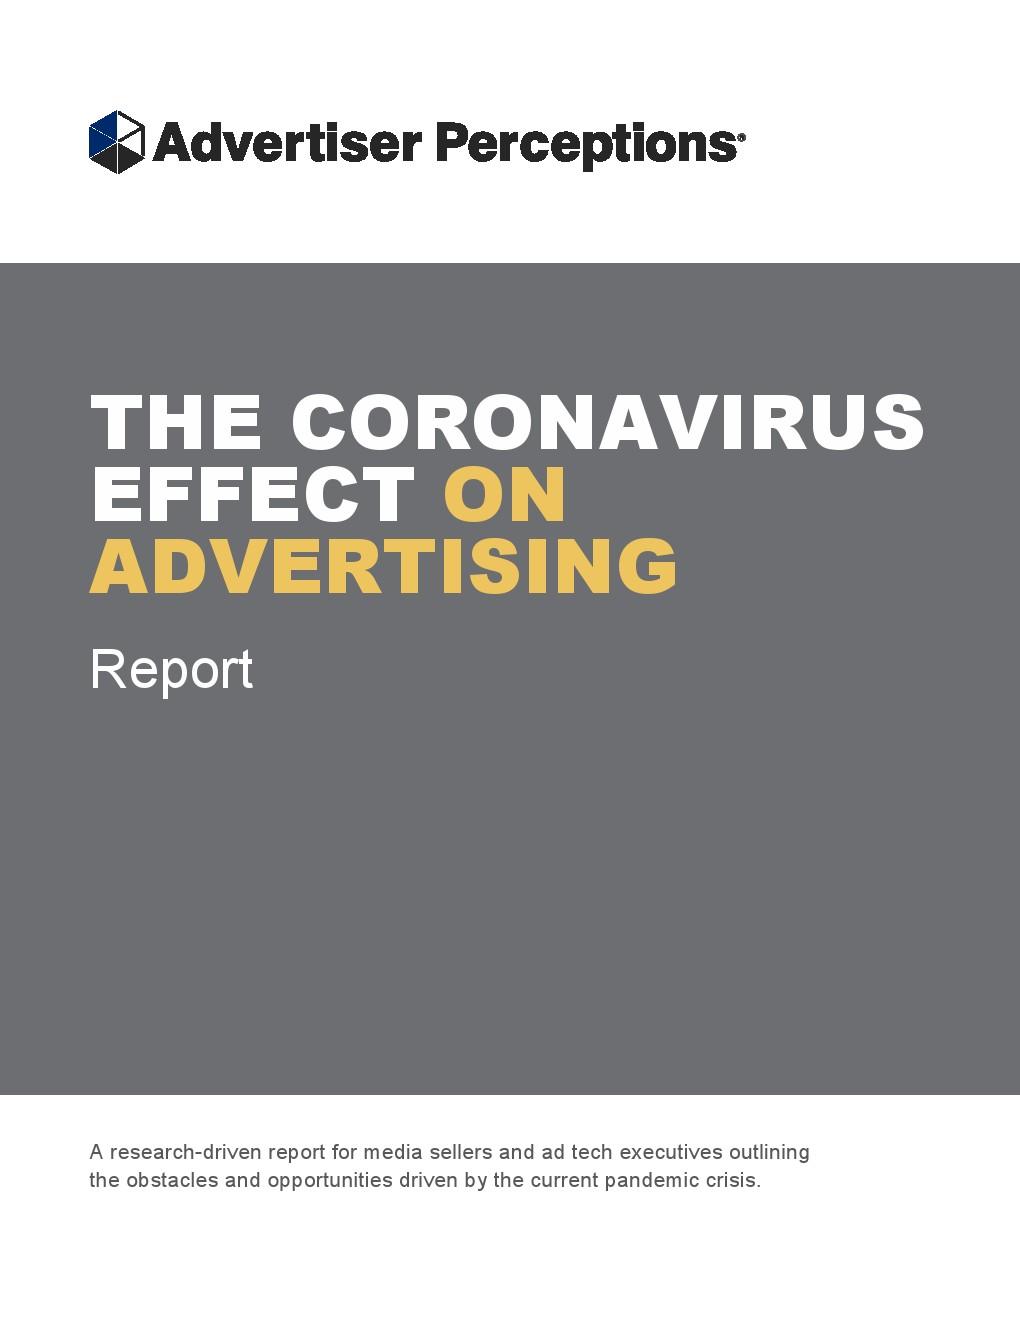 Advertiser Perceptions:冠状病毒致81%的广告商削减预算